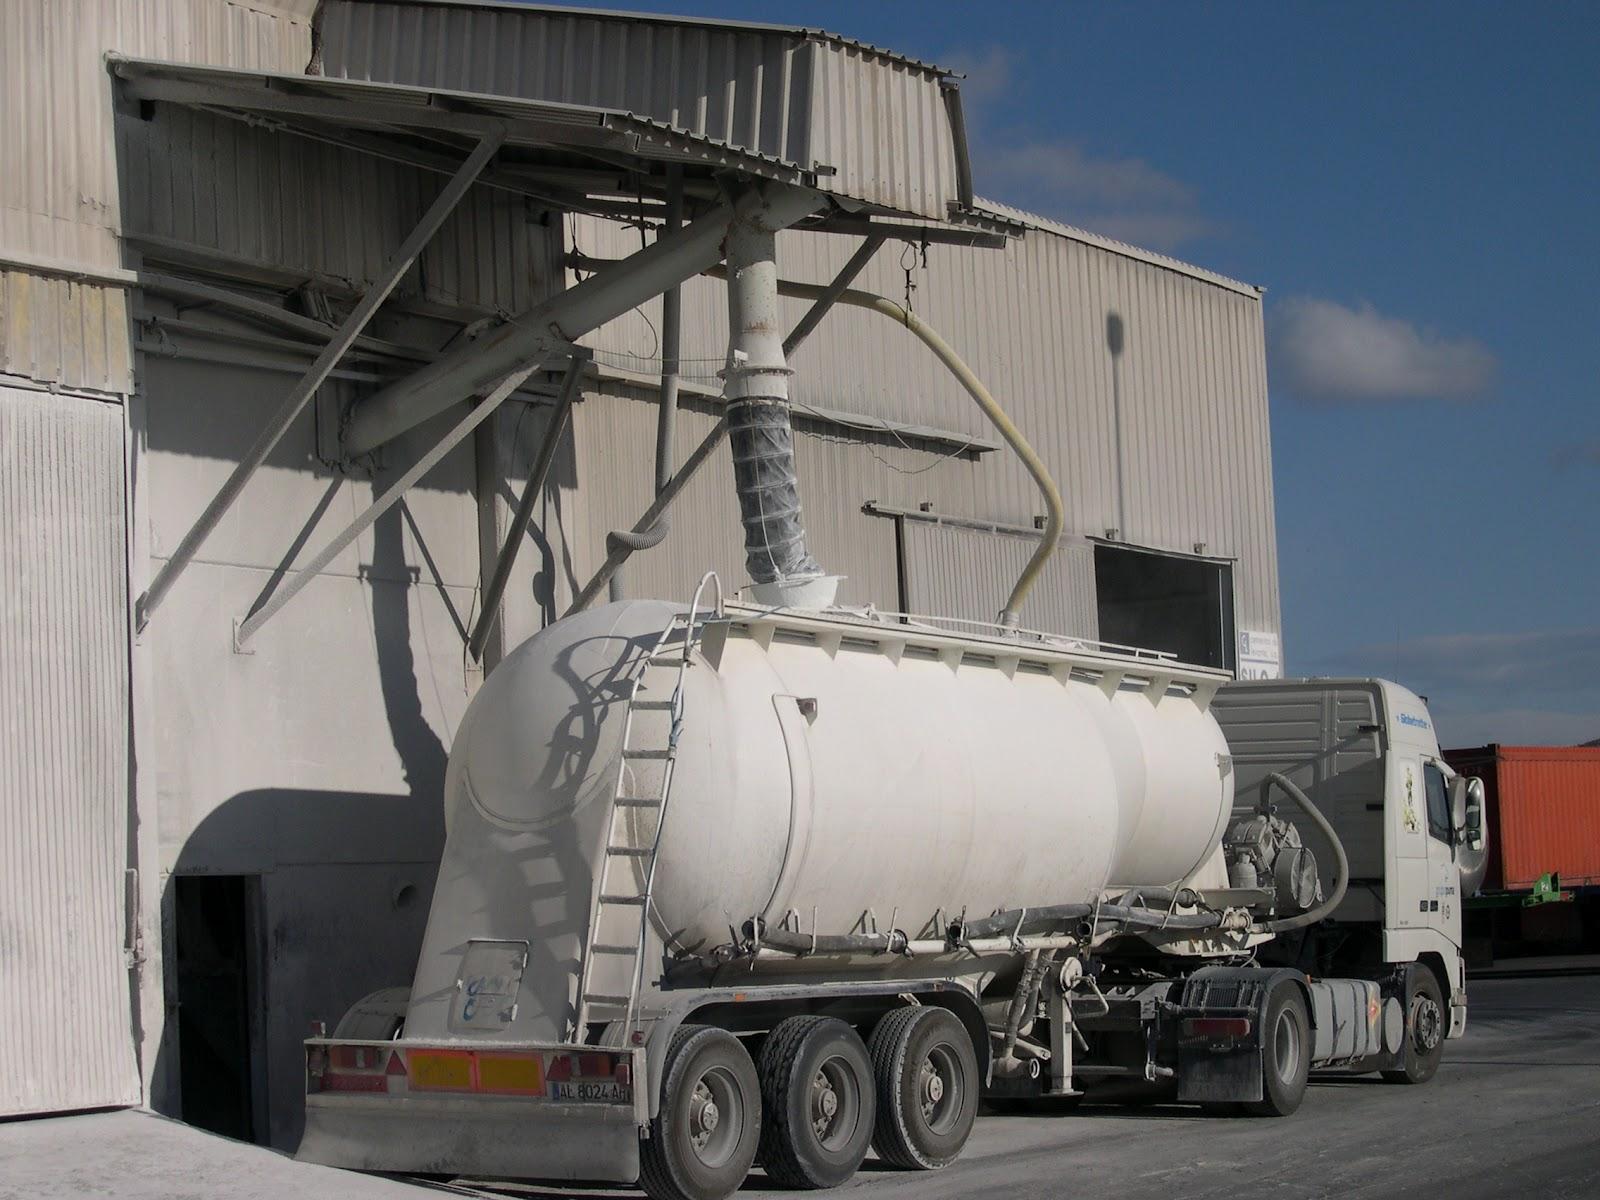 Cv de juan carlos lobo ram rez proyecto 8 for Cisternas de cemento